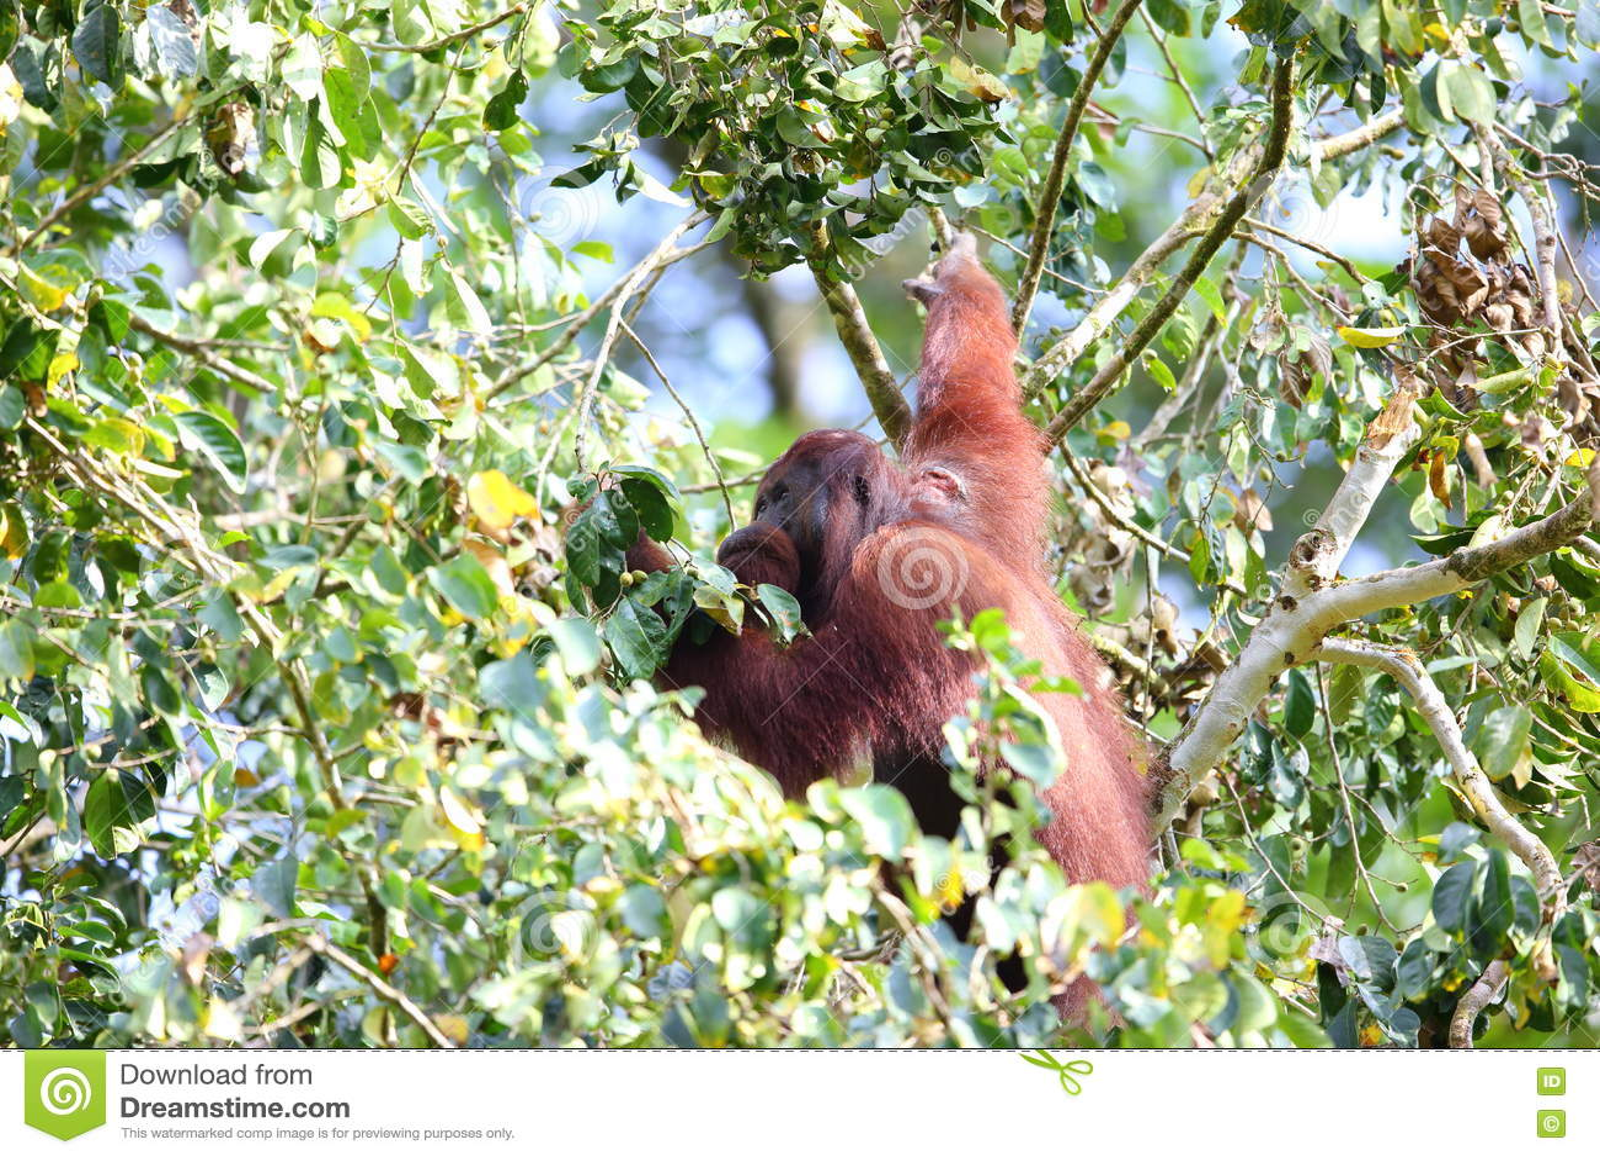 Download Borneo-Orang utan stock photo. Image of forest, rainforst - 58084350